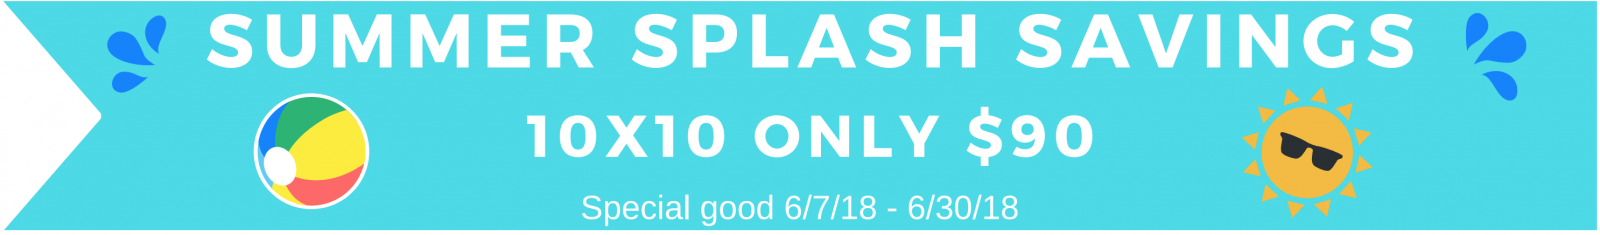 Summer Splash Savings 10x10 only $90